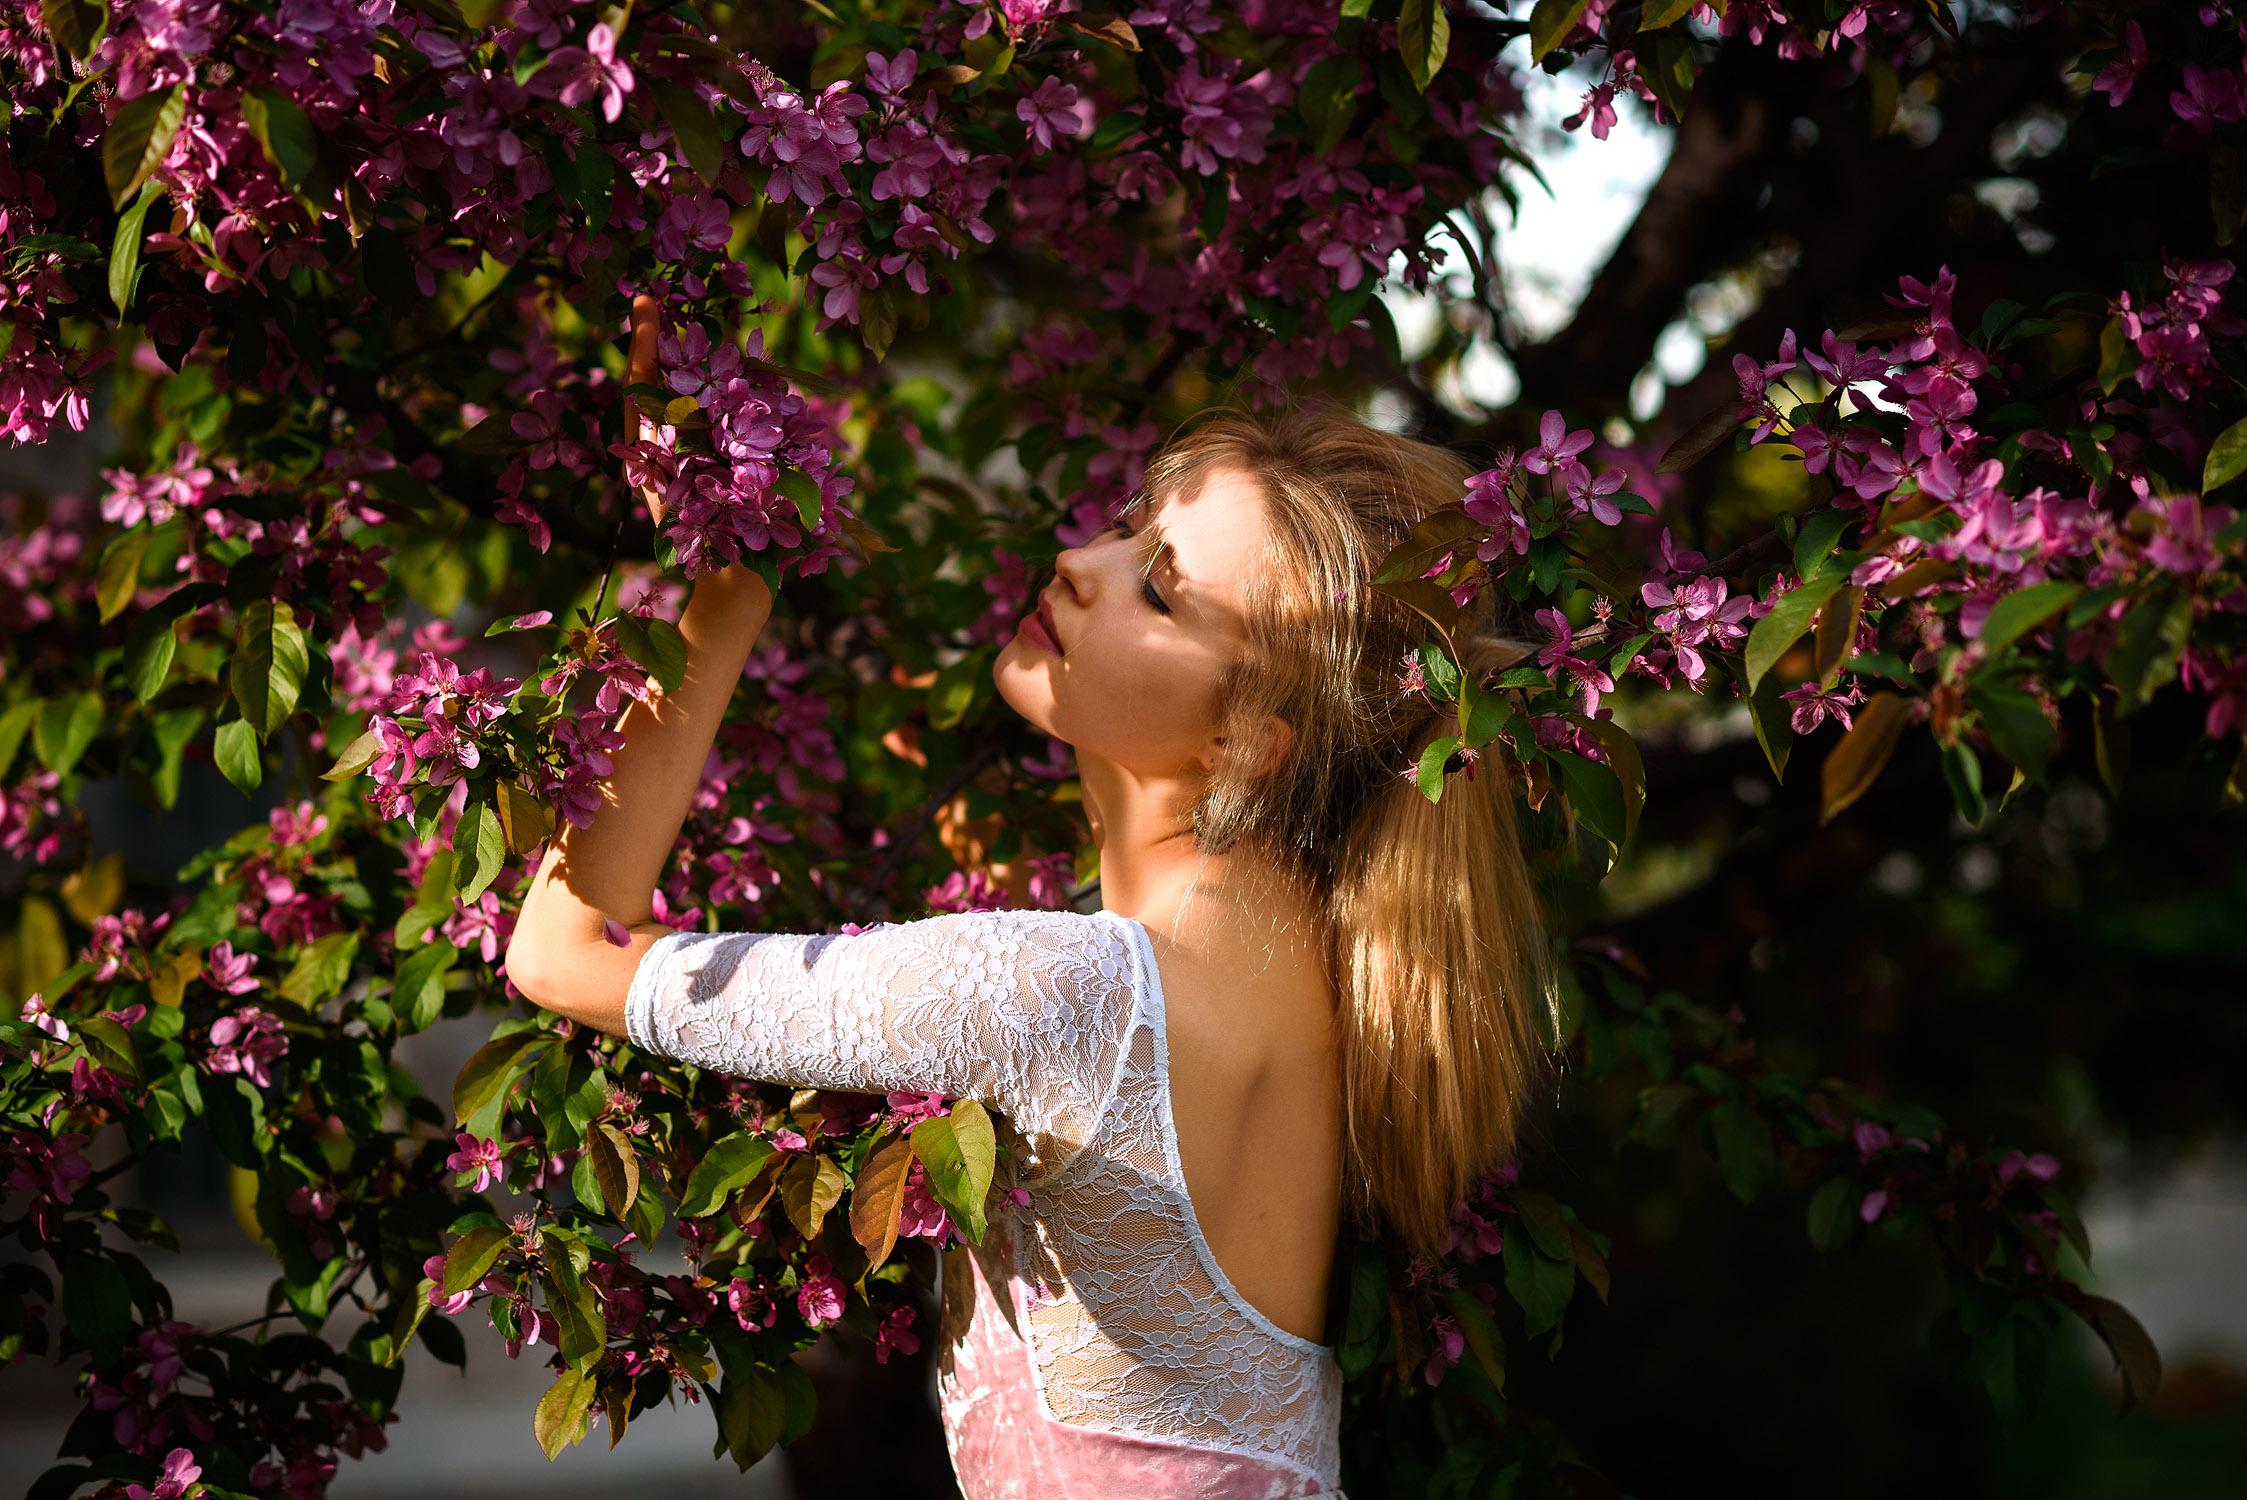 marianne-flowers-201706-publish-order-6.jpg